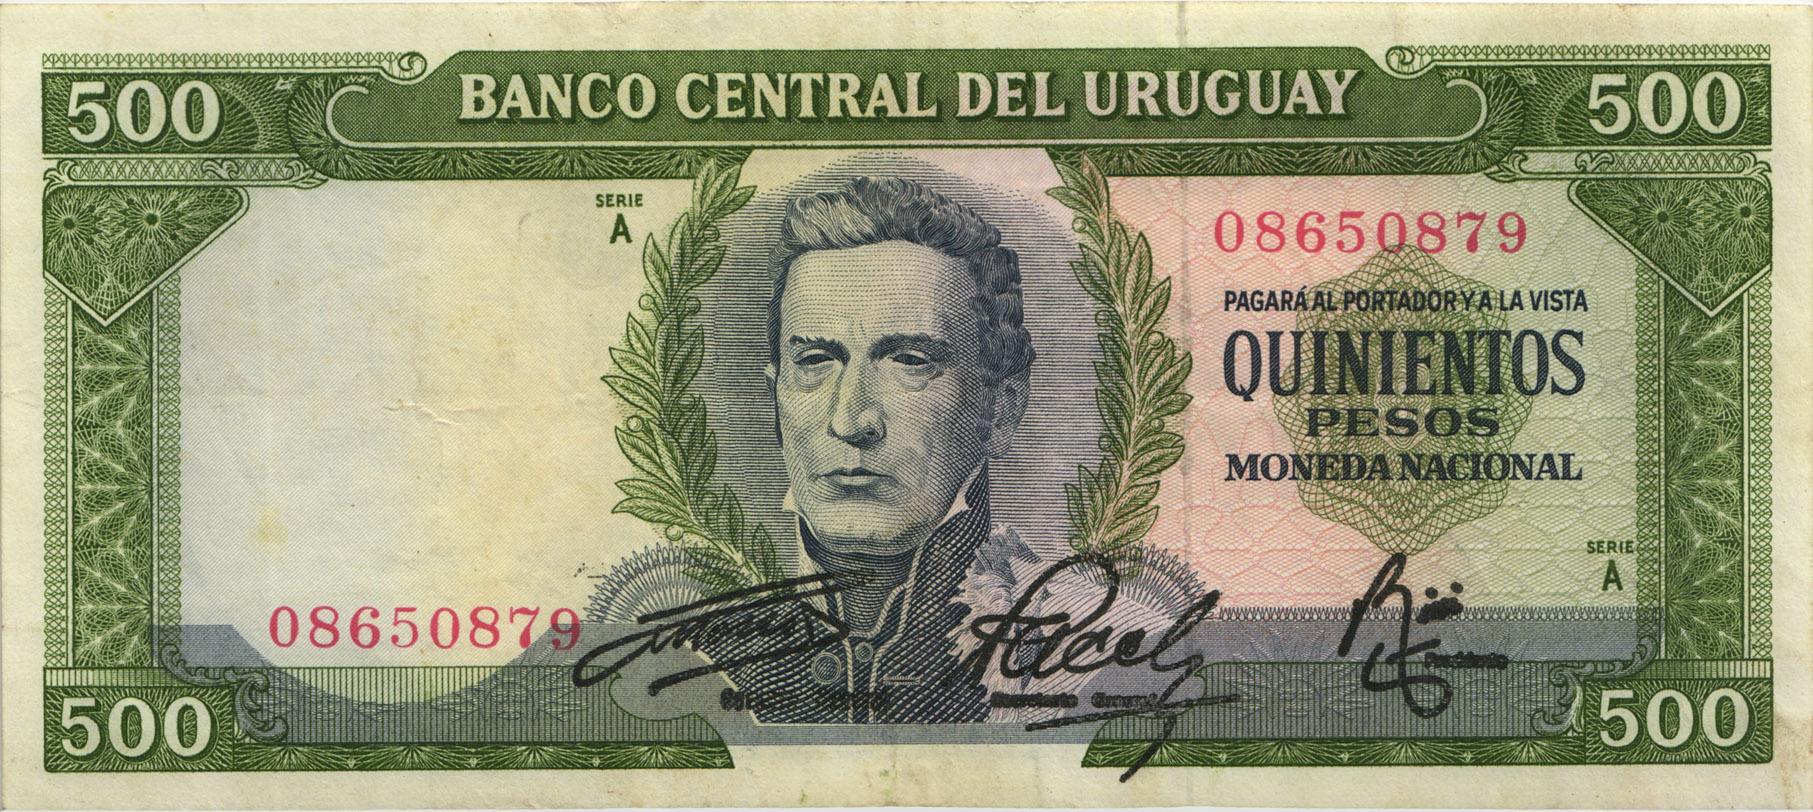 Uruguay 200 Pesos Uruguayos 2000 - Uruguayan Currency Bank